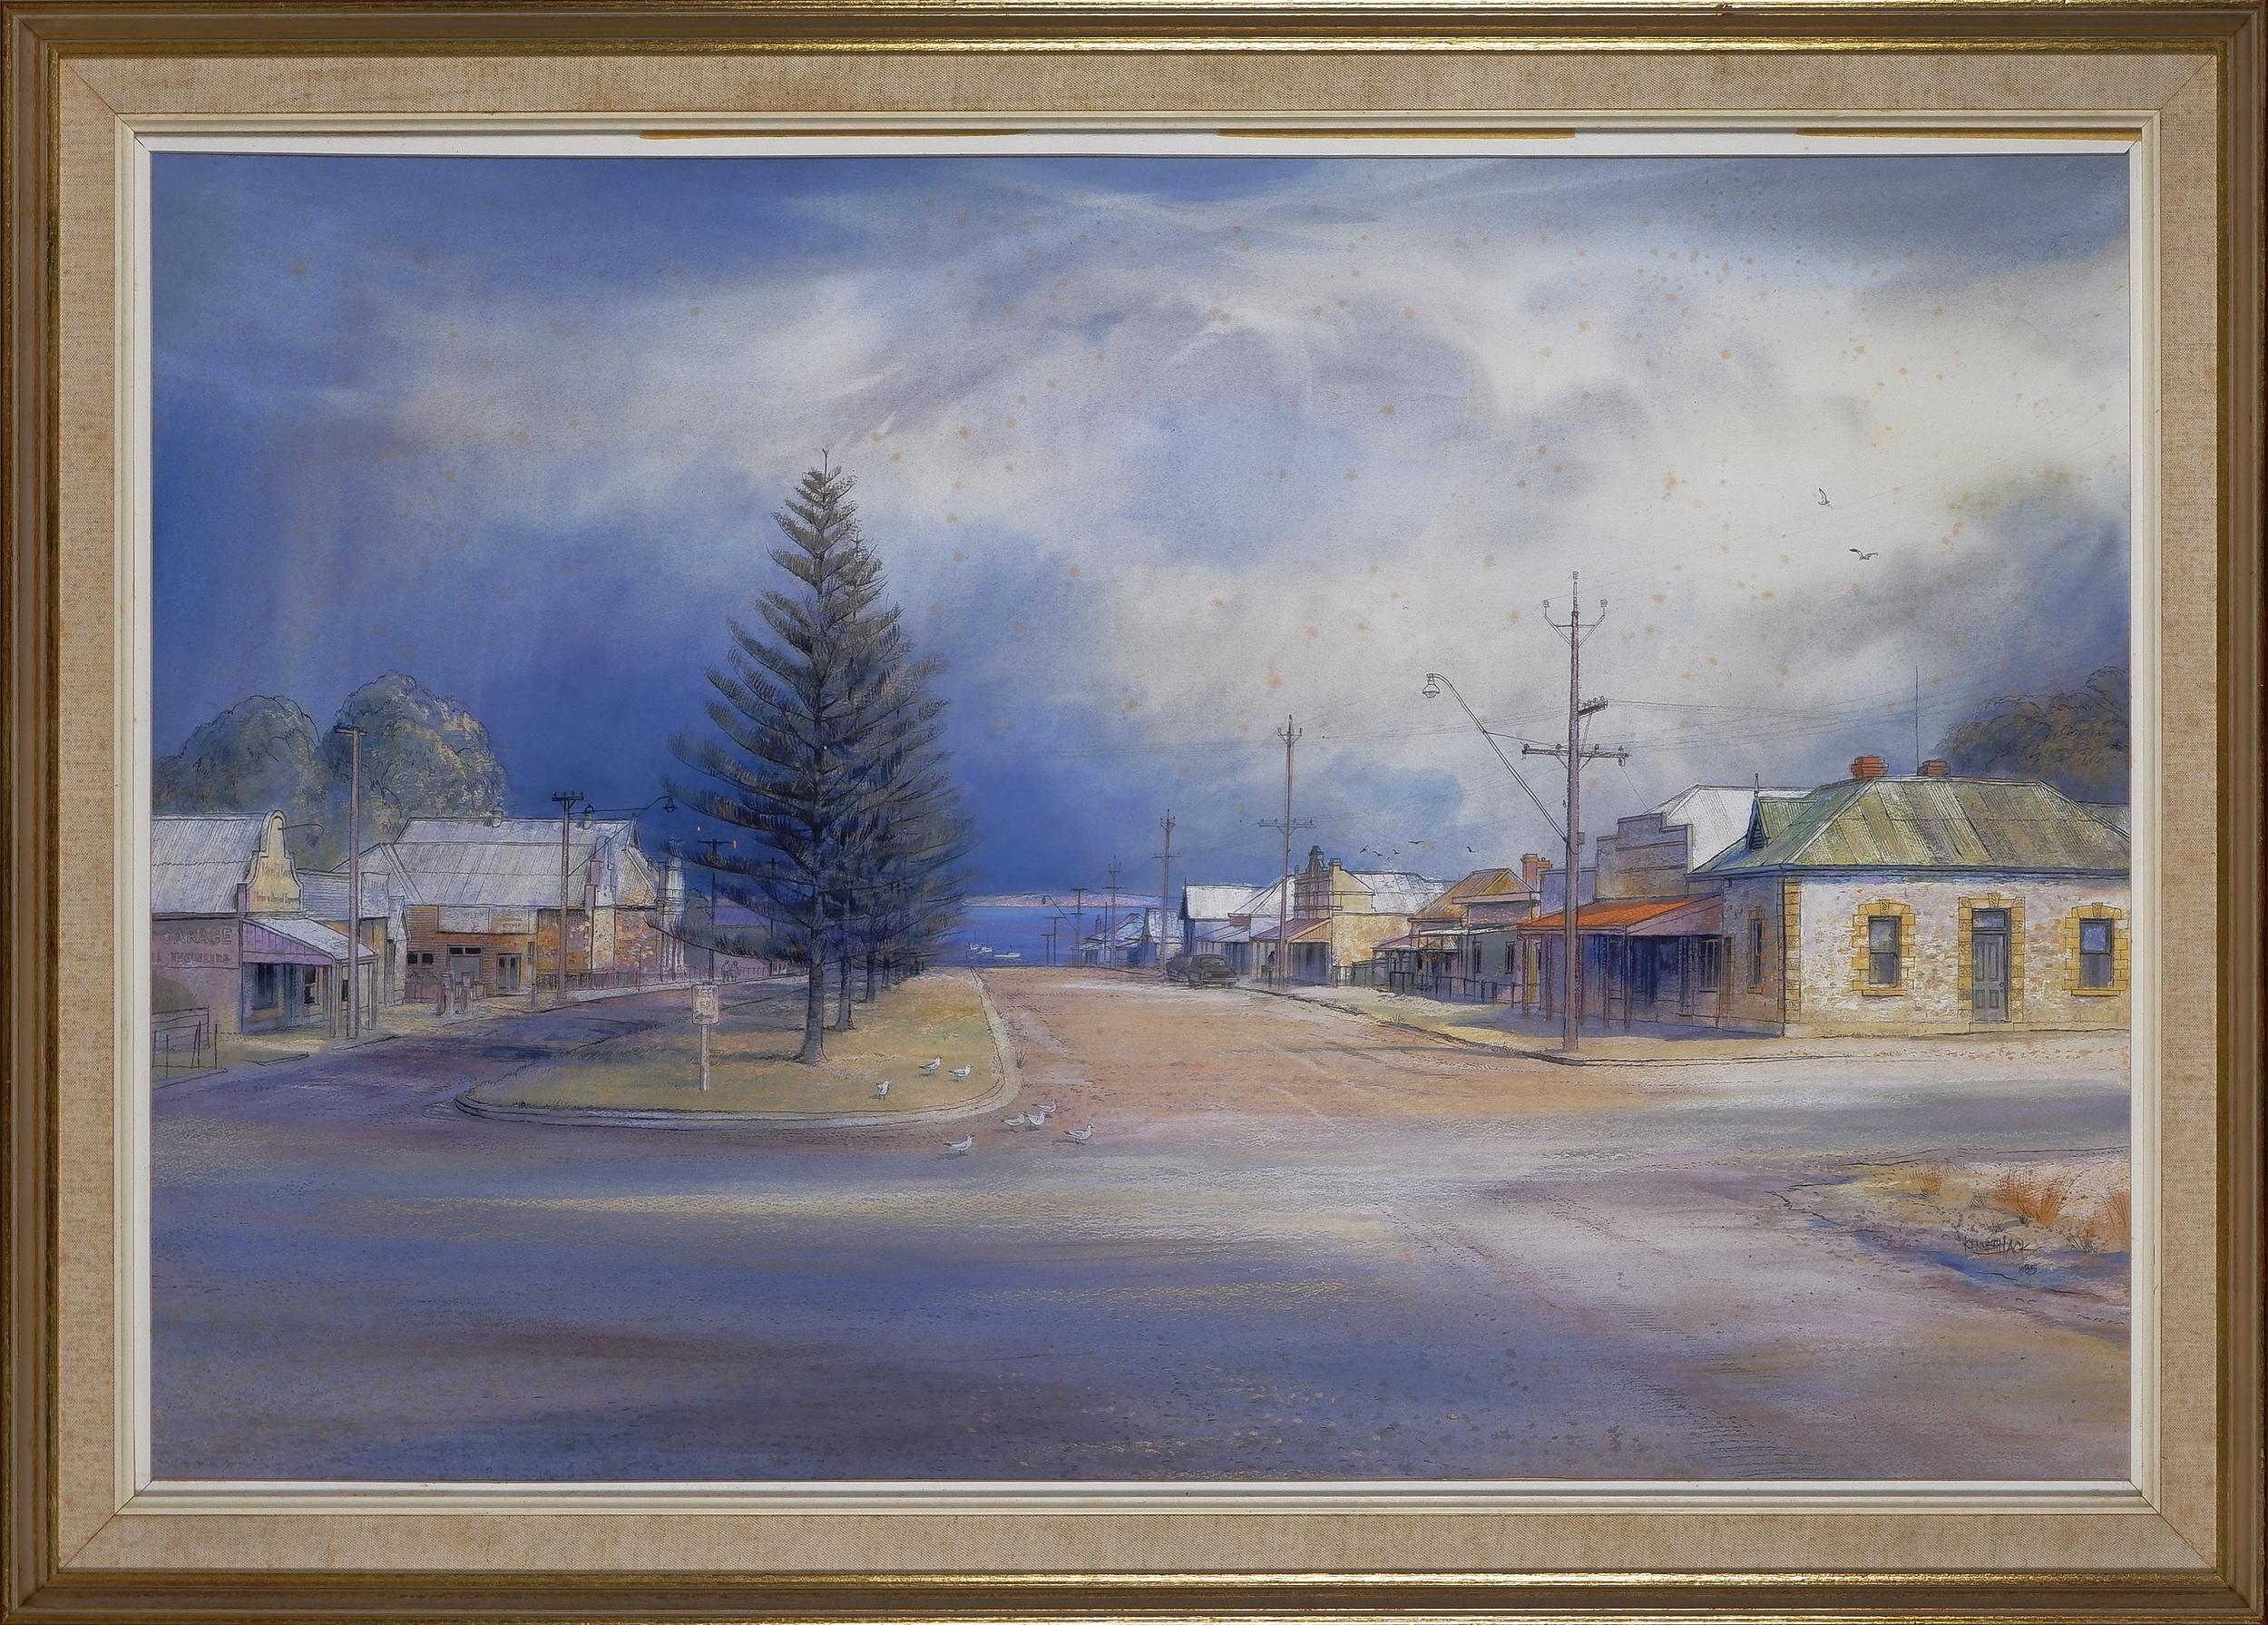 'Kenneth Jack (1924-2006), Port Victoria, South Australia 1985, Watercolour on Paper'